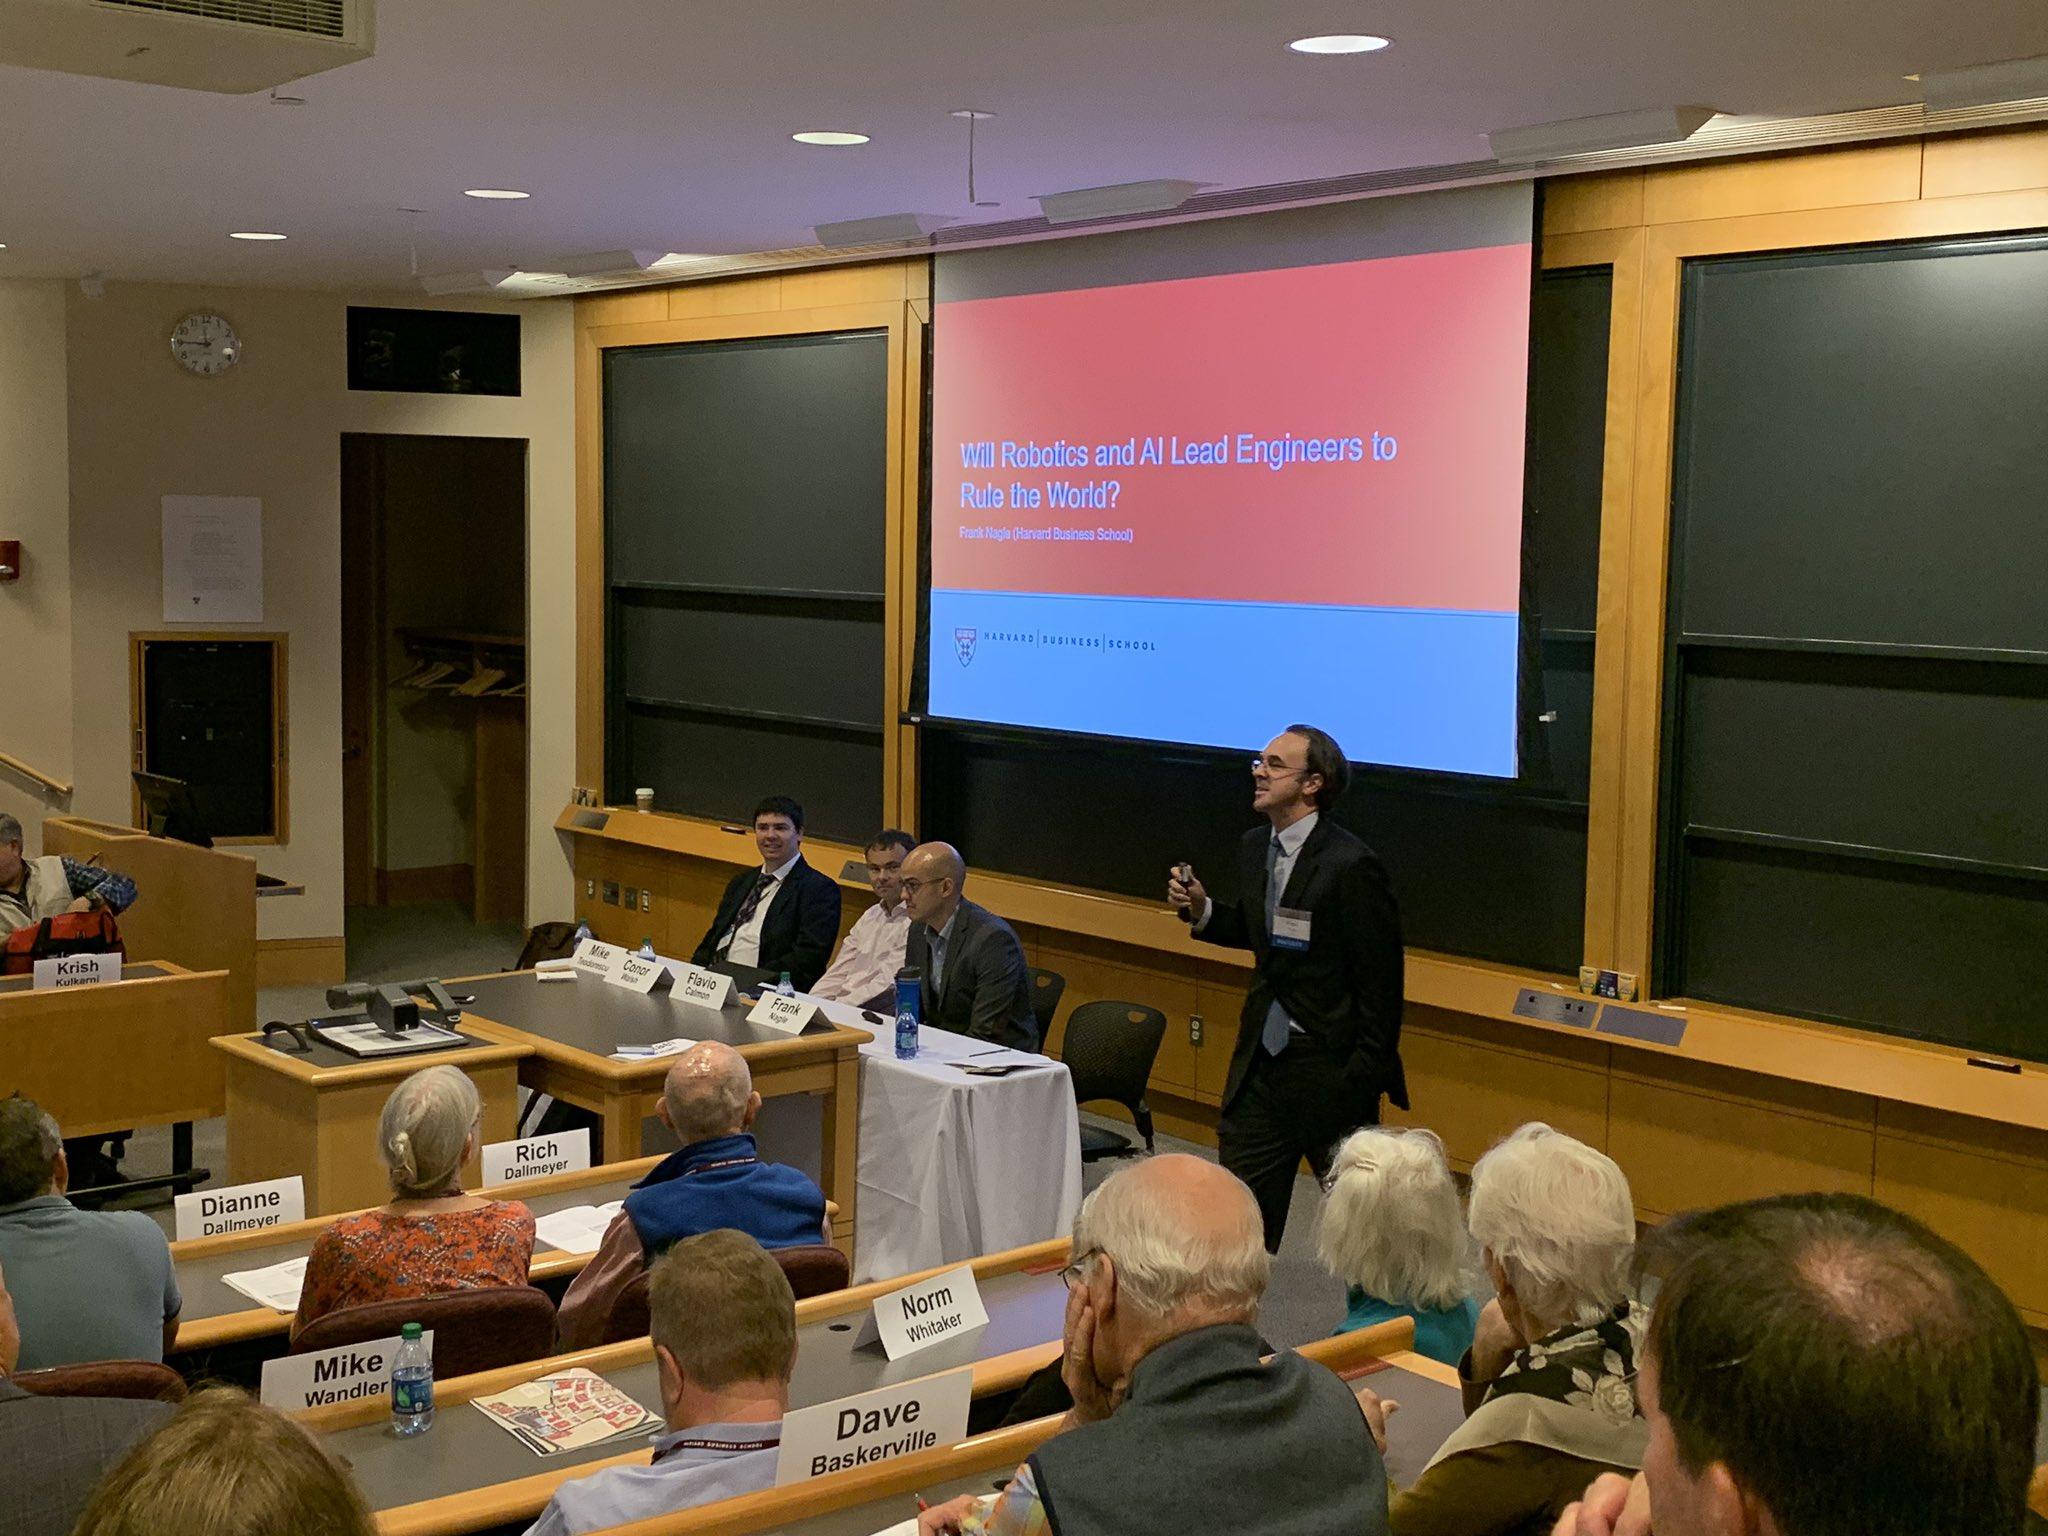 Professor @frank_nagle leading his #HBSreunion2019 session. https://t.co/UzIBbw0mif